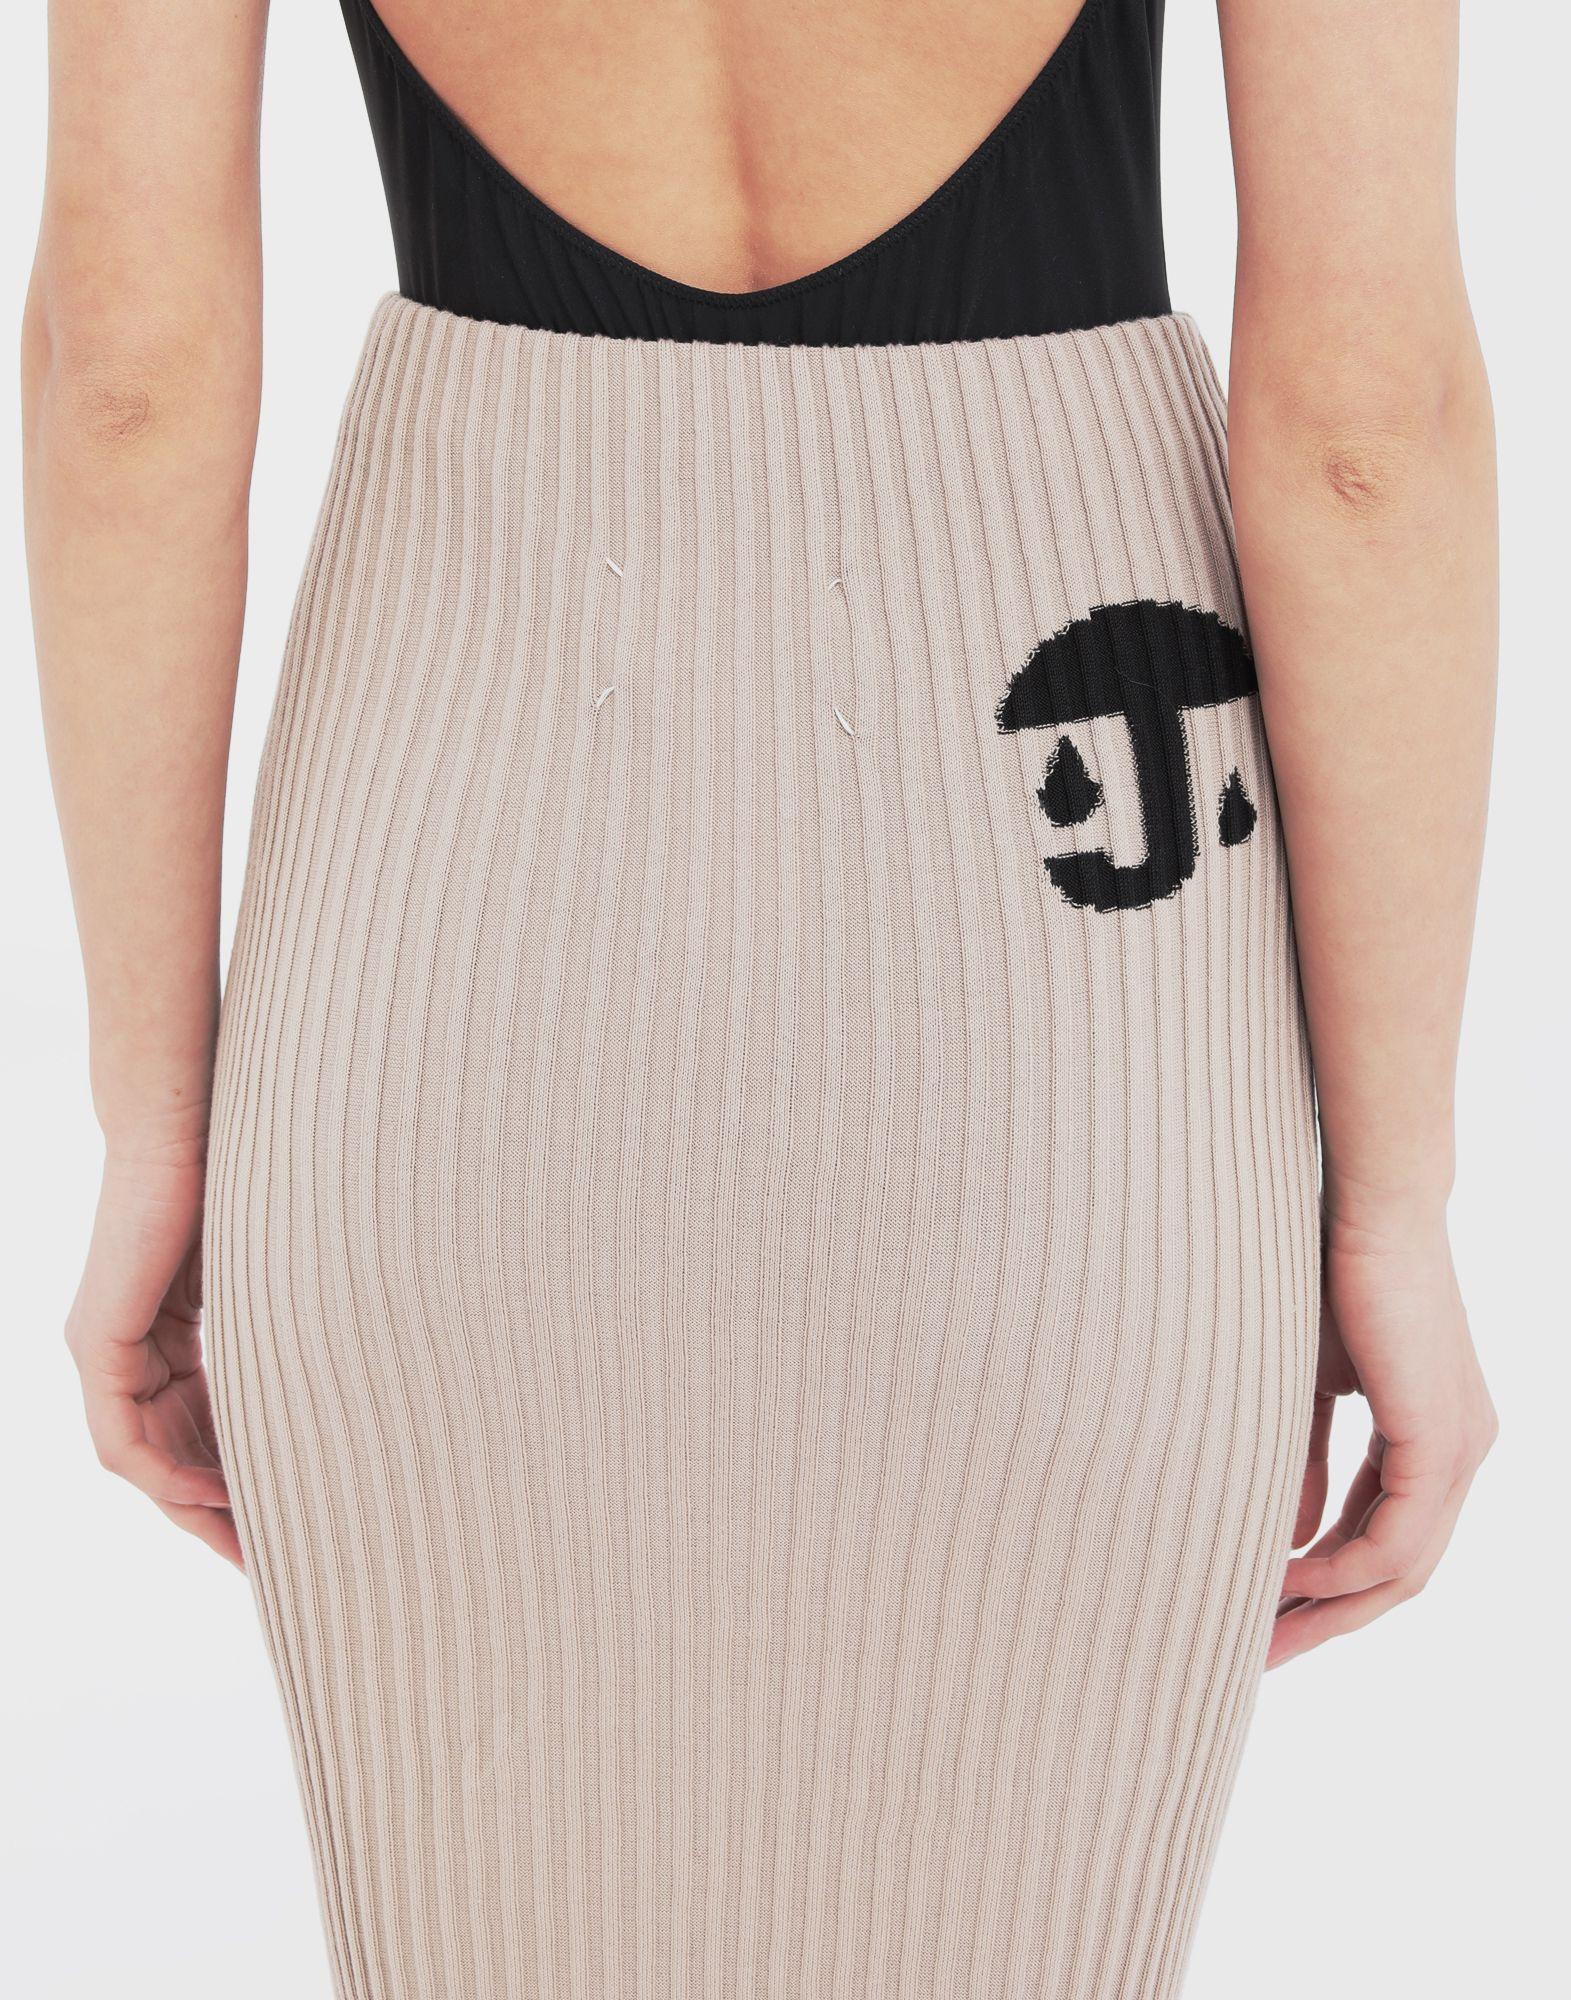 MAISON MARGIELA Knit ribs skirt in 'Carton' intarsia 3/4 length skirt Woman b